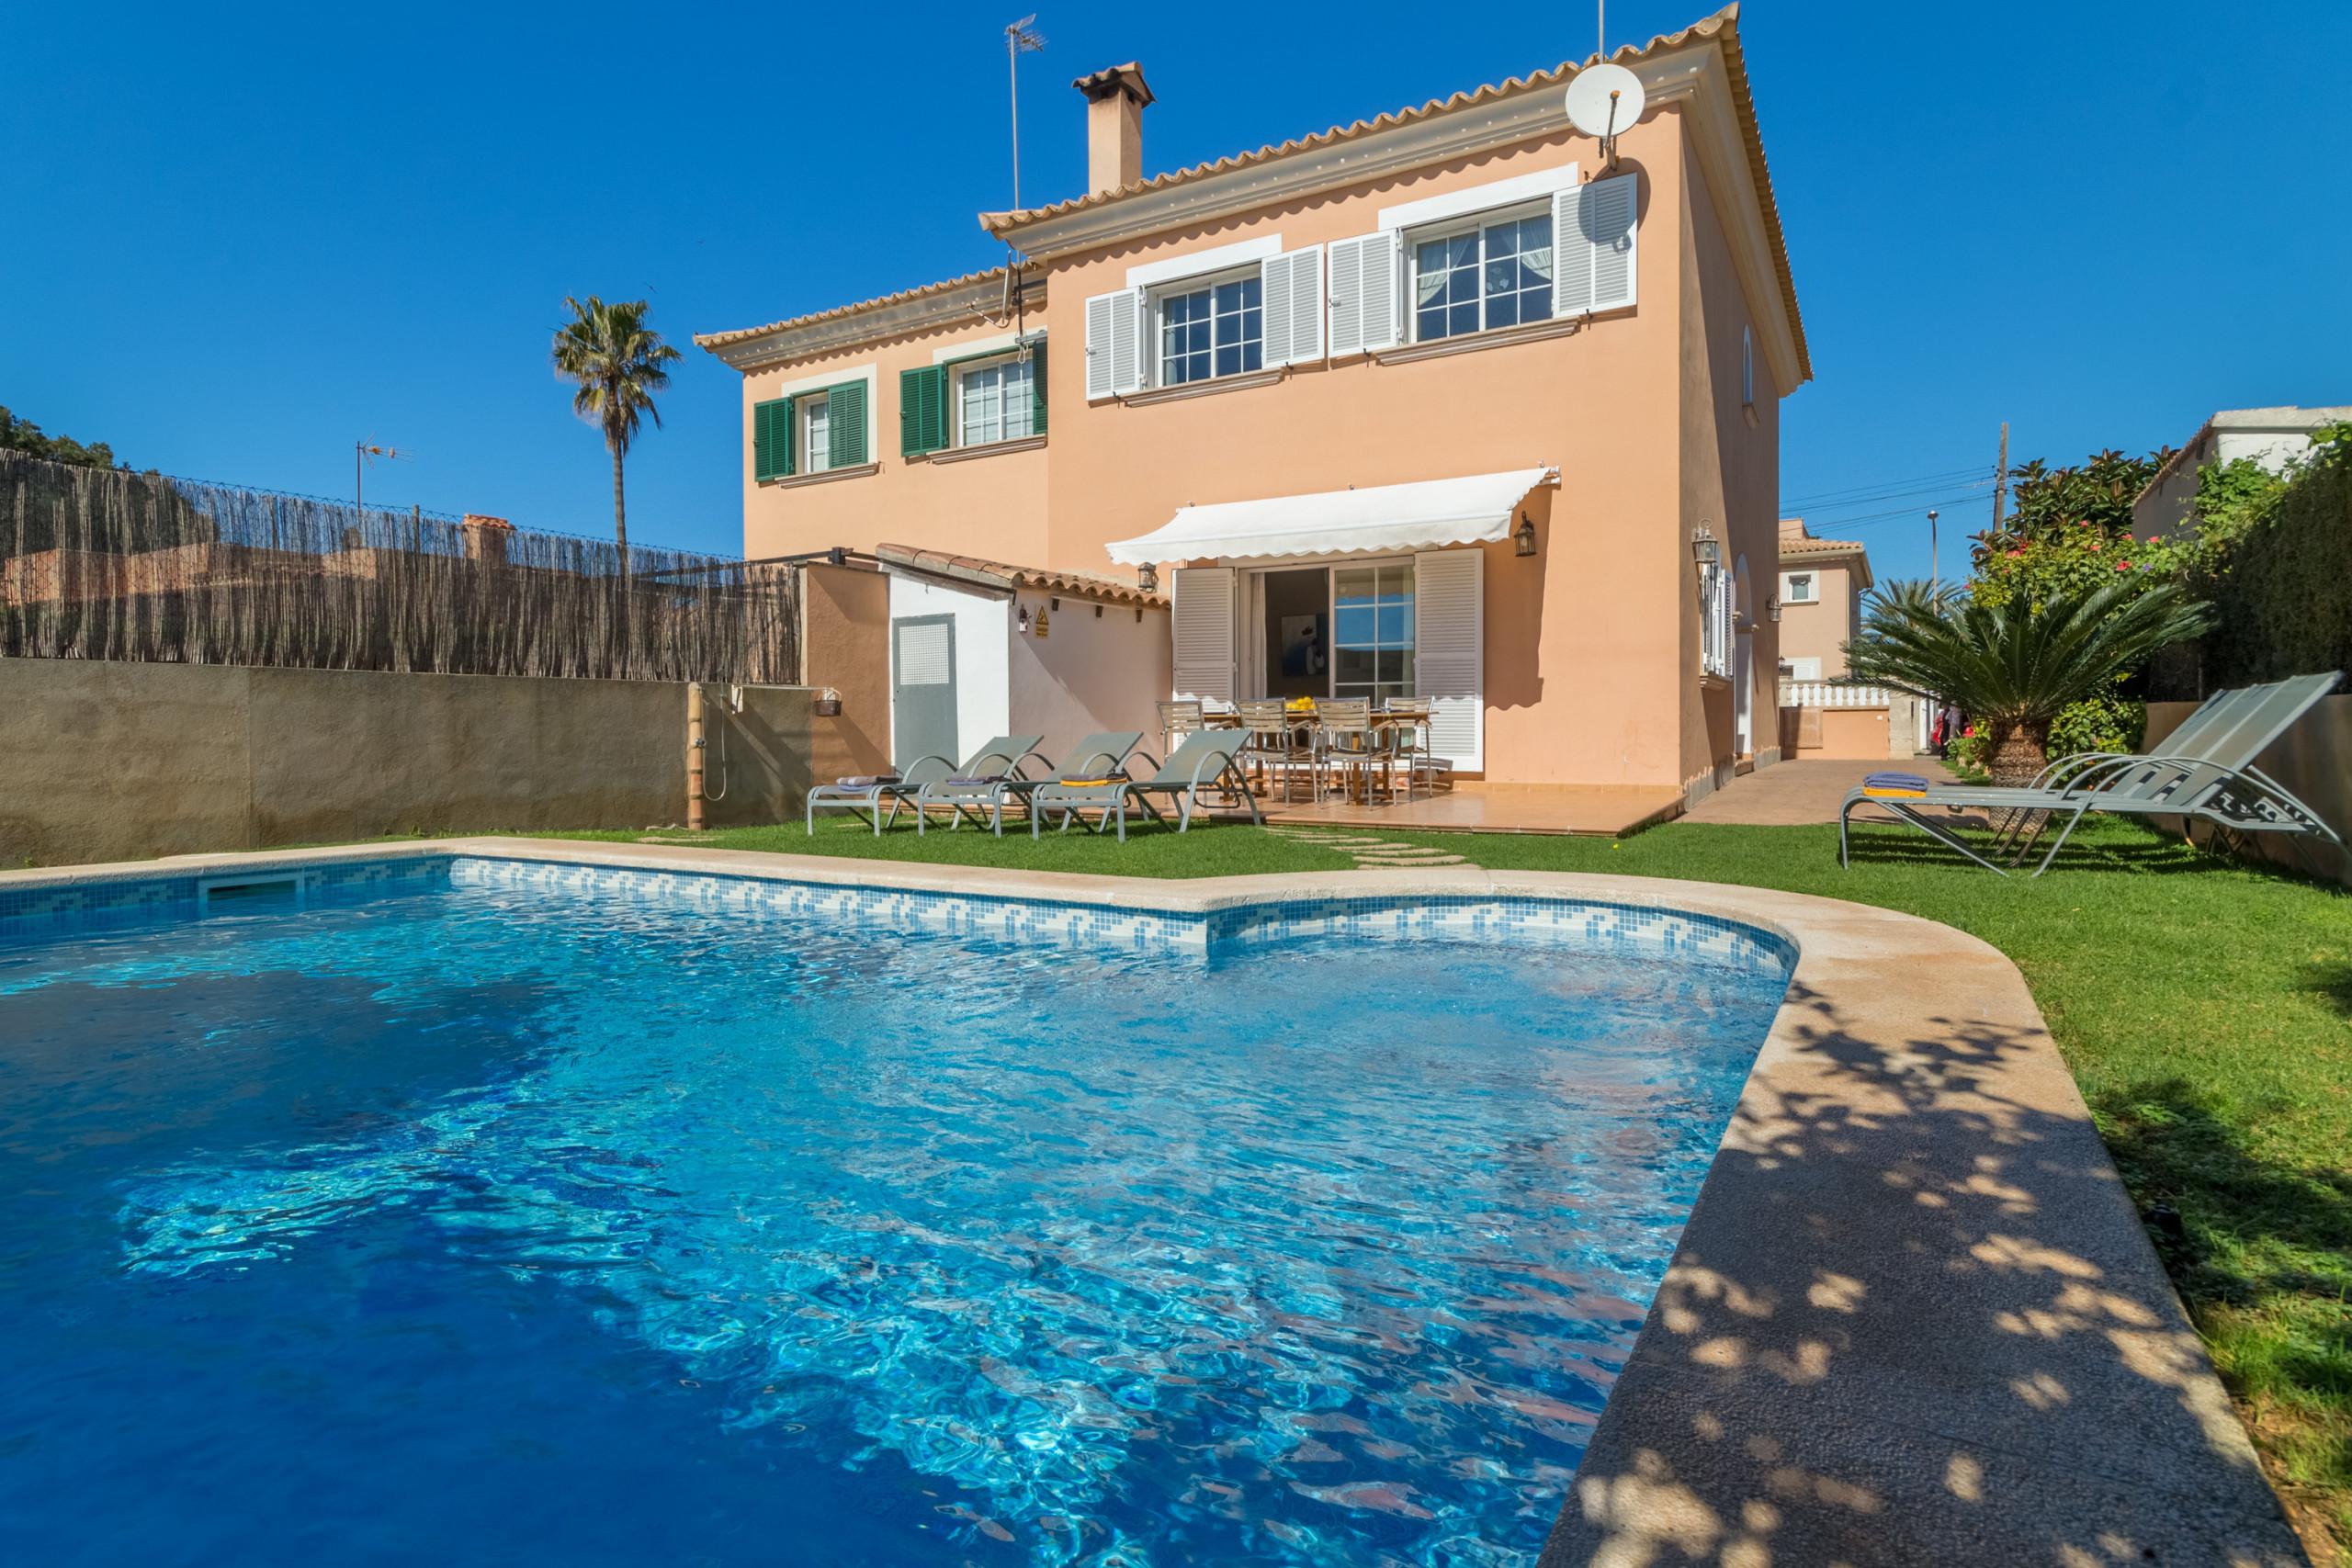 à Bahía Grande - Bahia Xalana, House 5StarsHome Mallorca